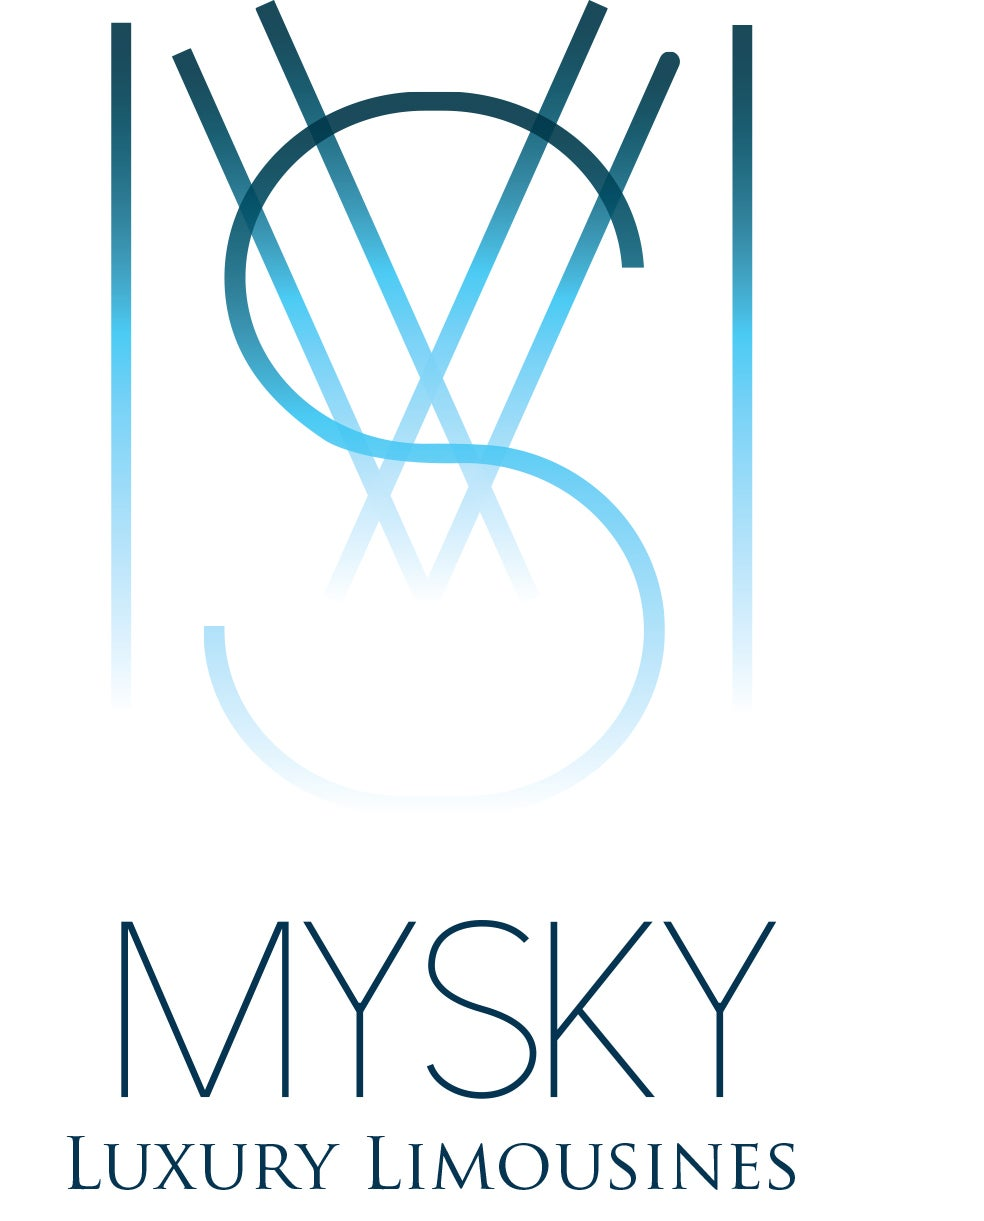 MySky Luxury Limousine logo.jpg